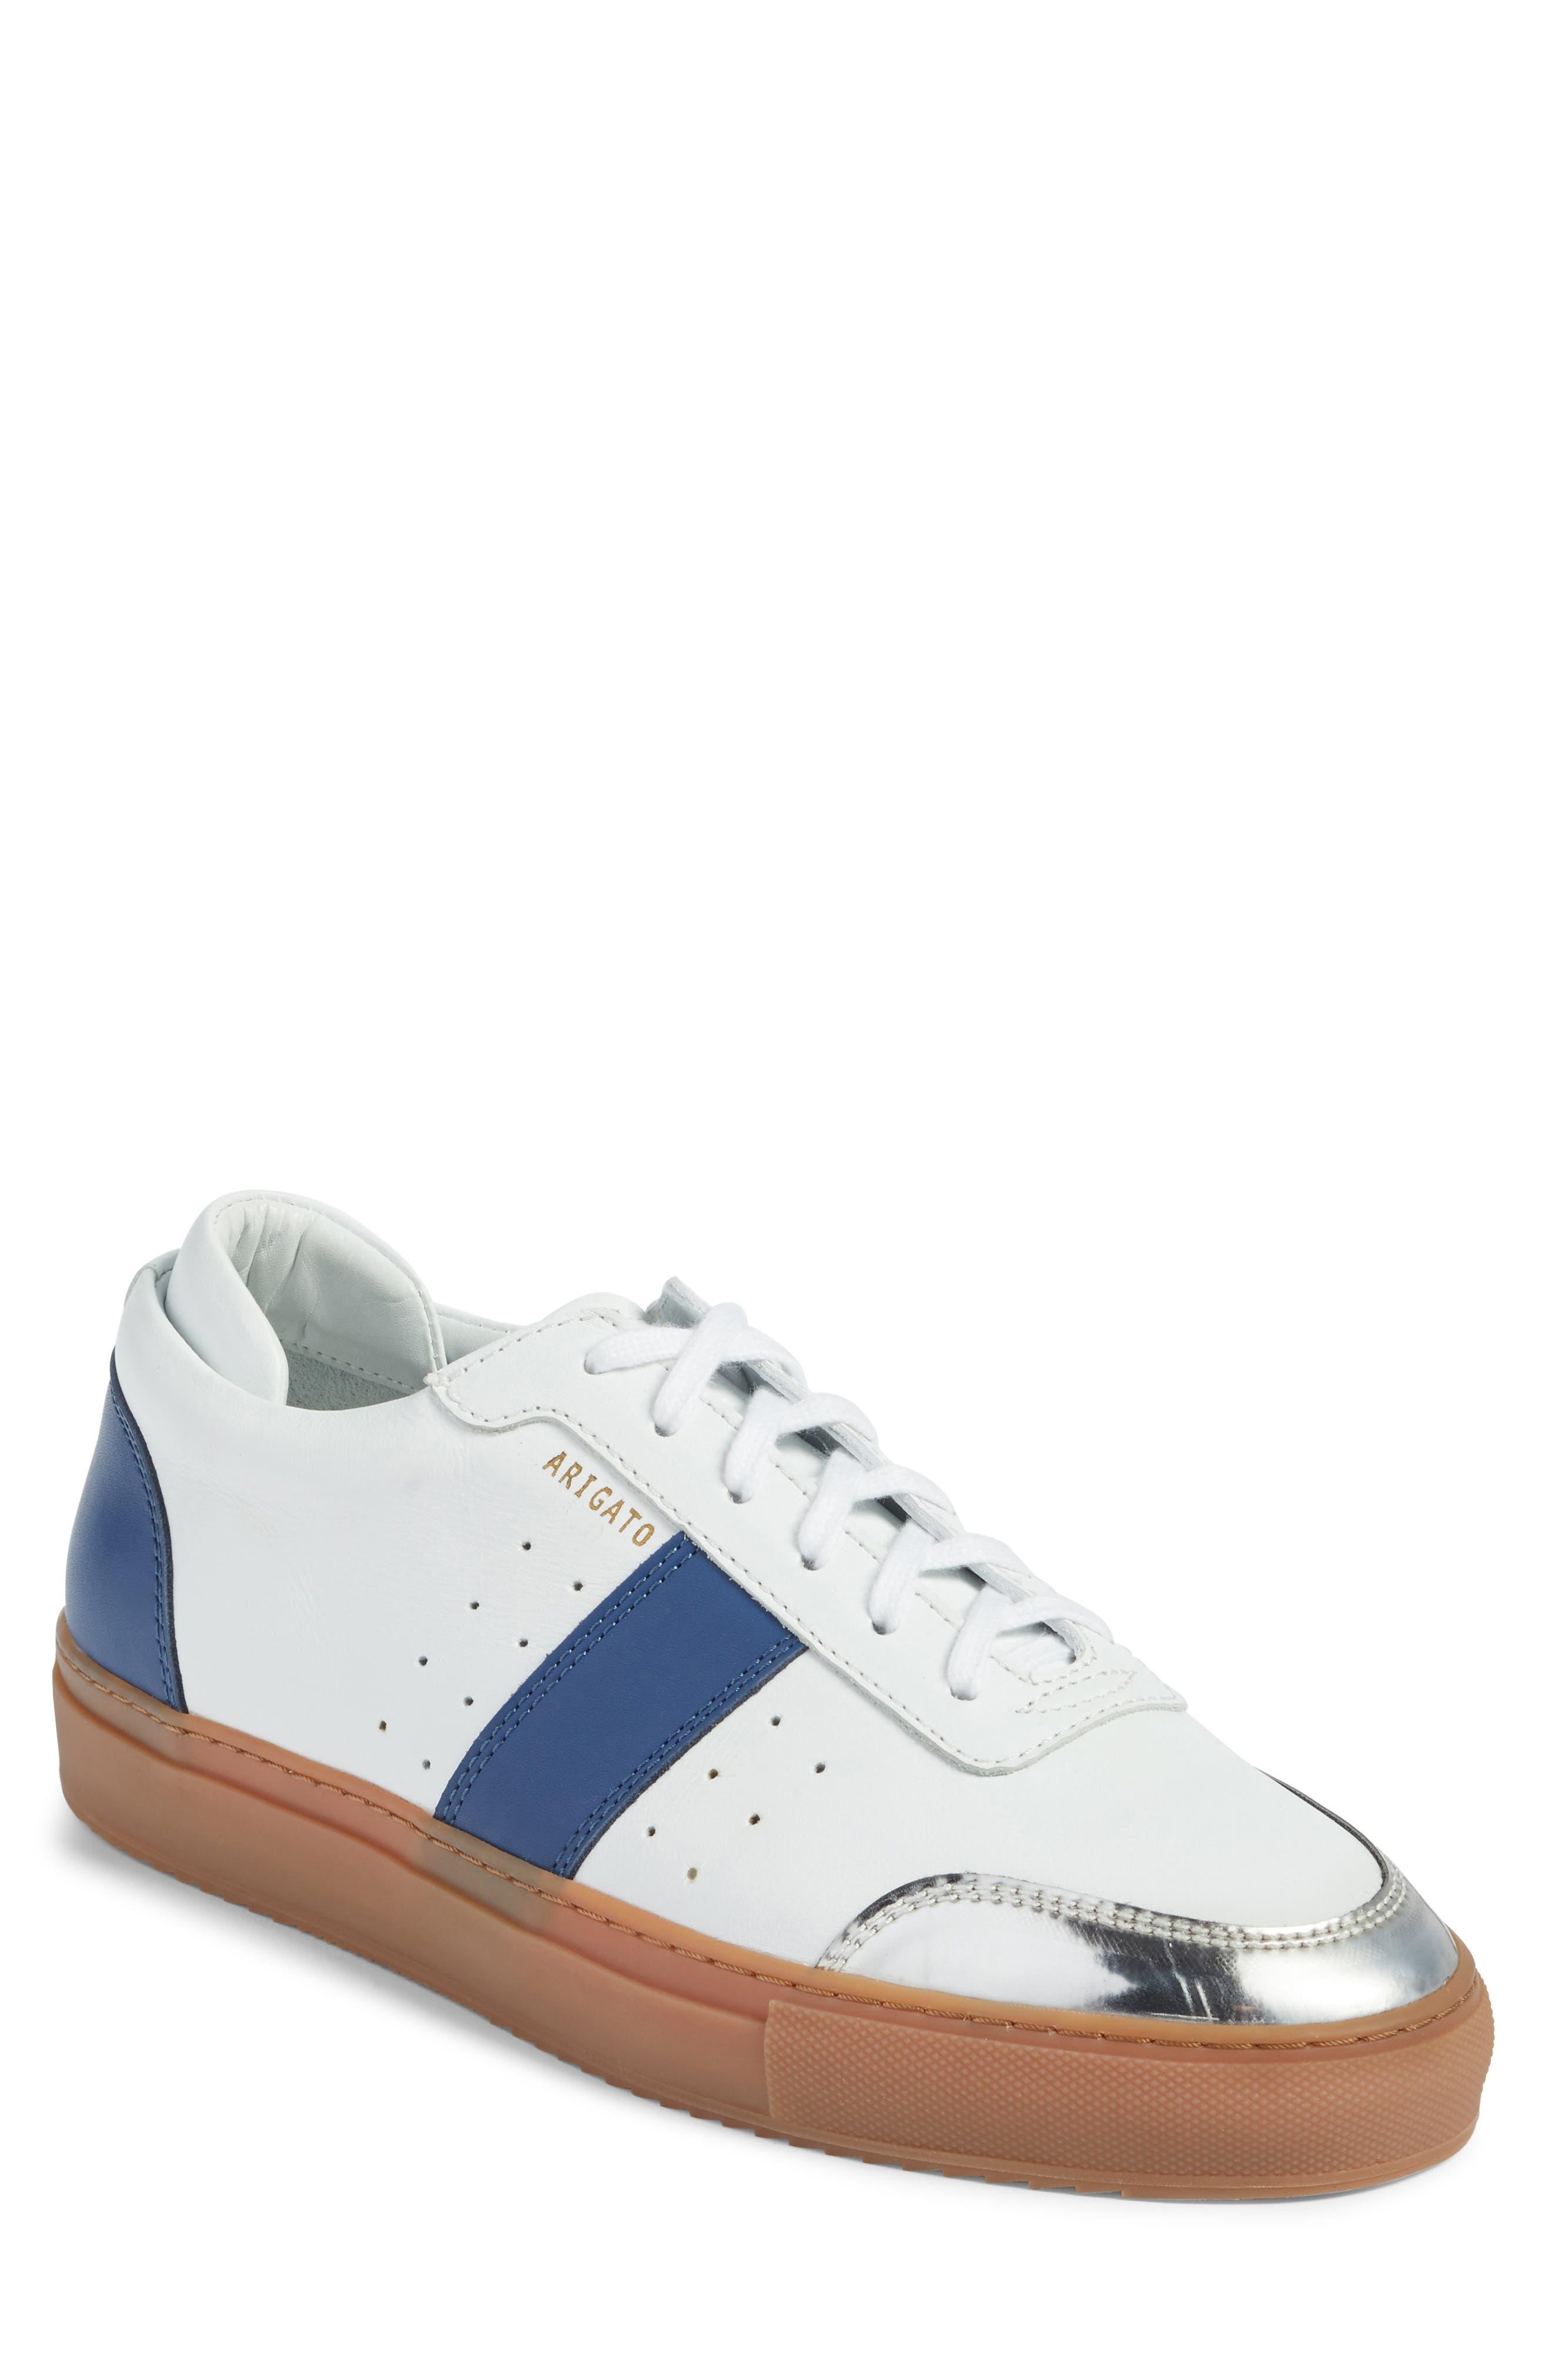 Dunk Sneaker,                             Main thumbnail 1, color,                             White/ Navy